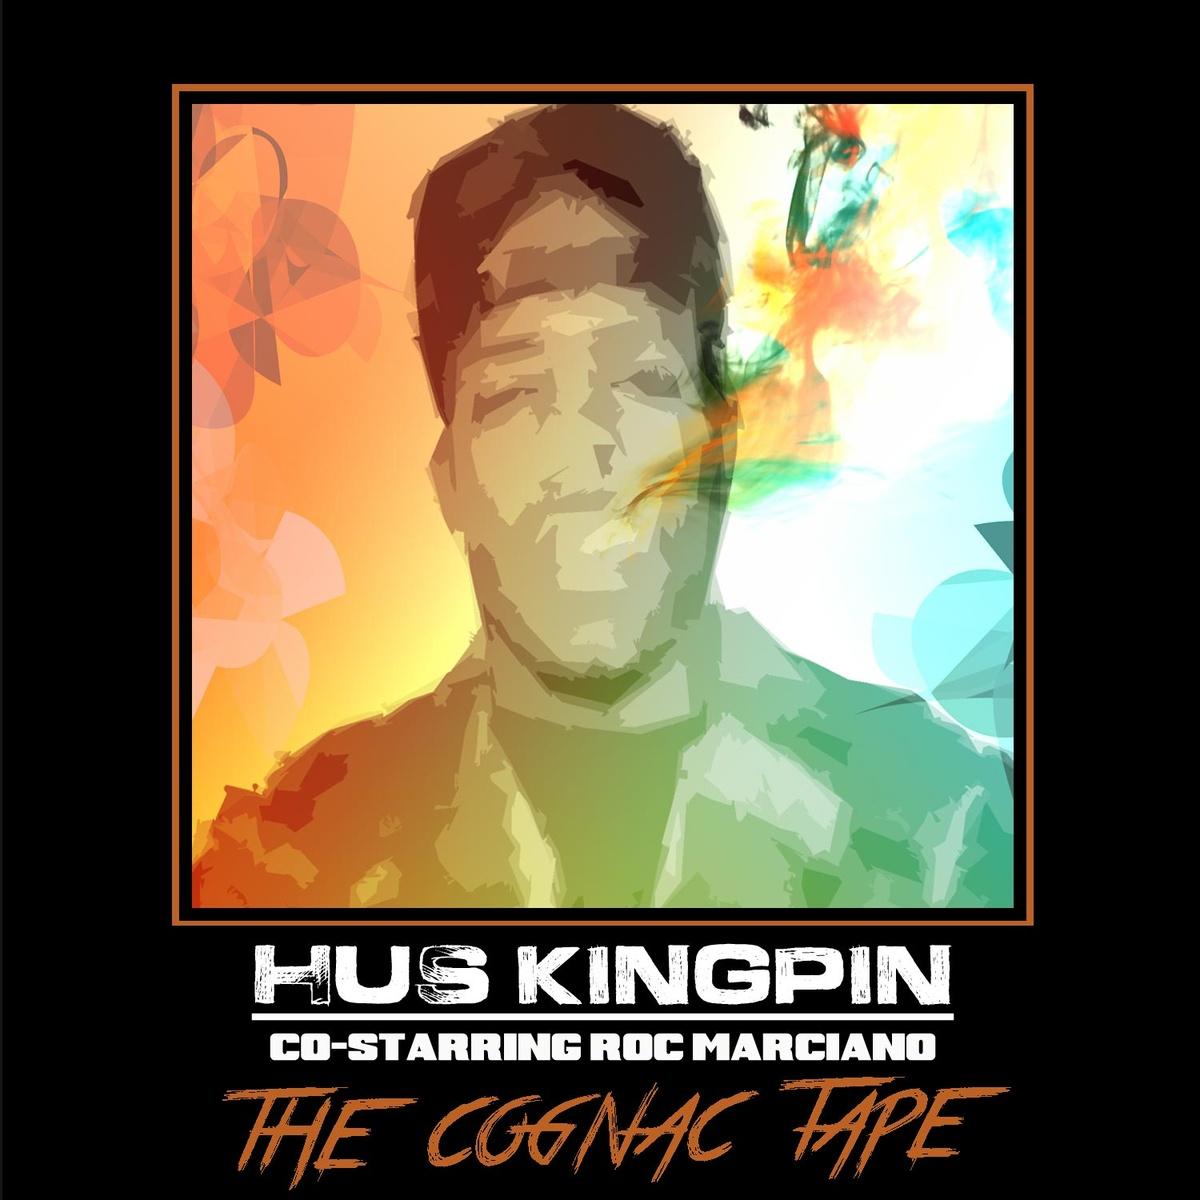 Hus Kingpin